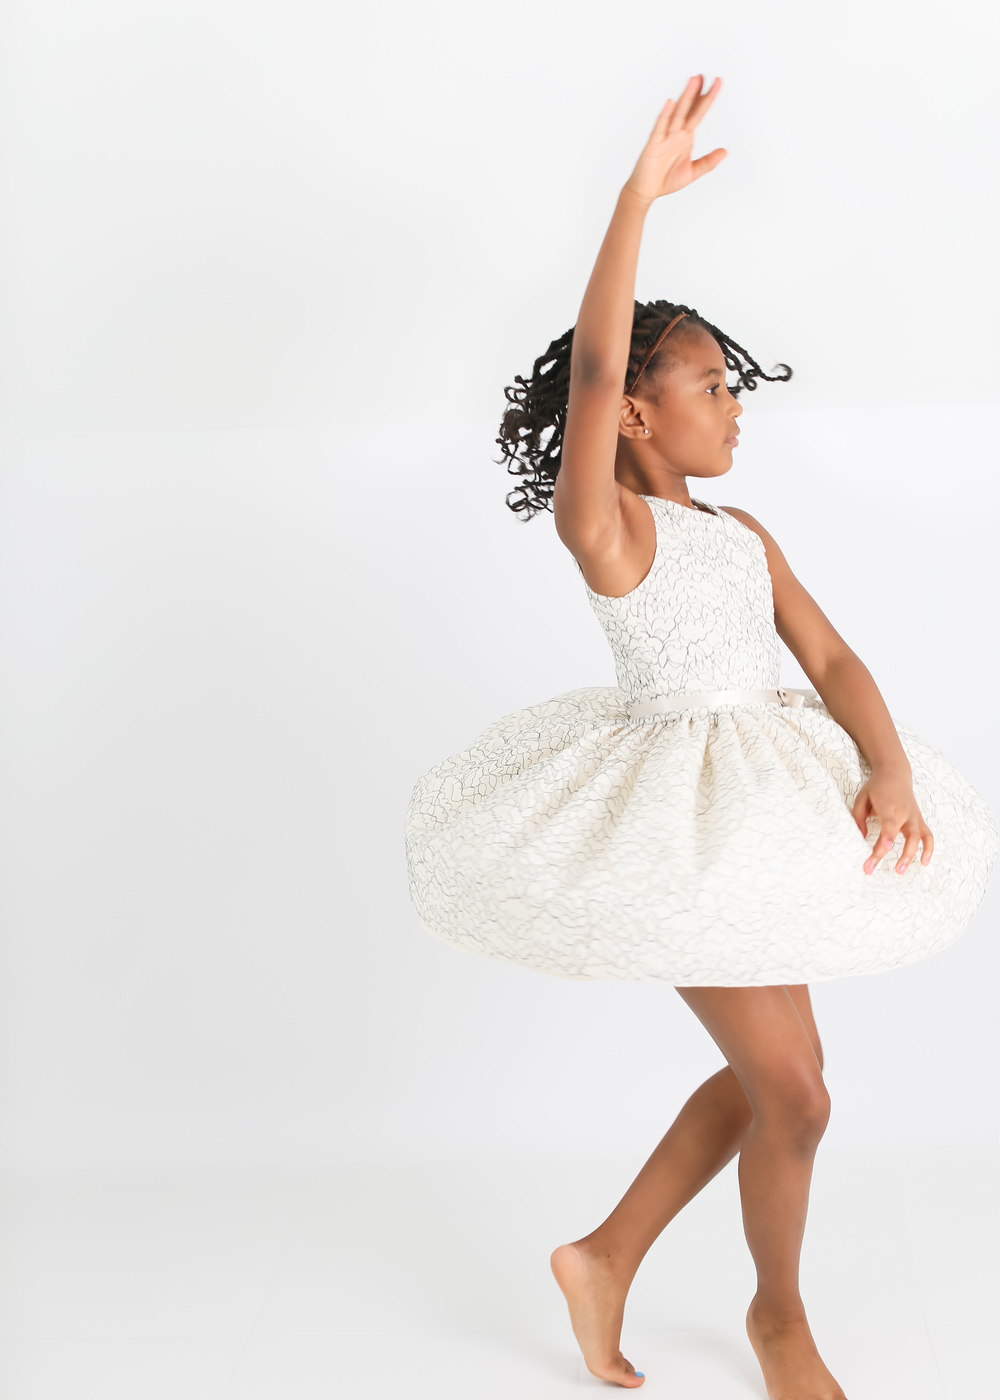 little-girl-dancing